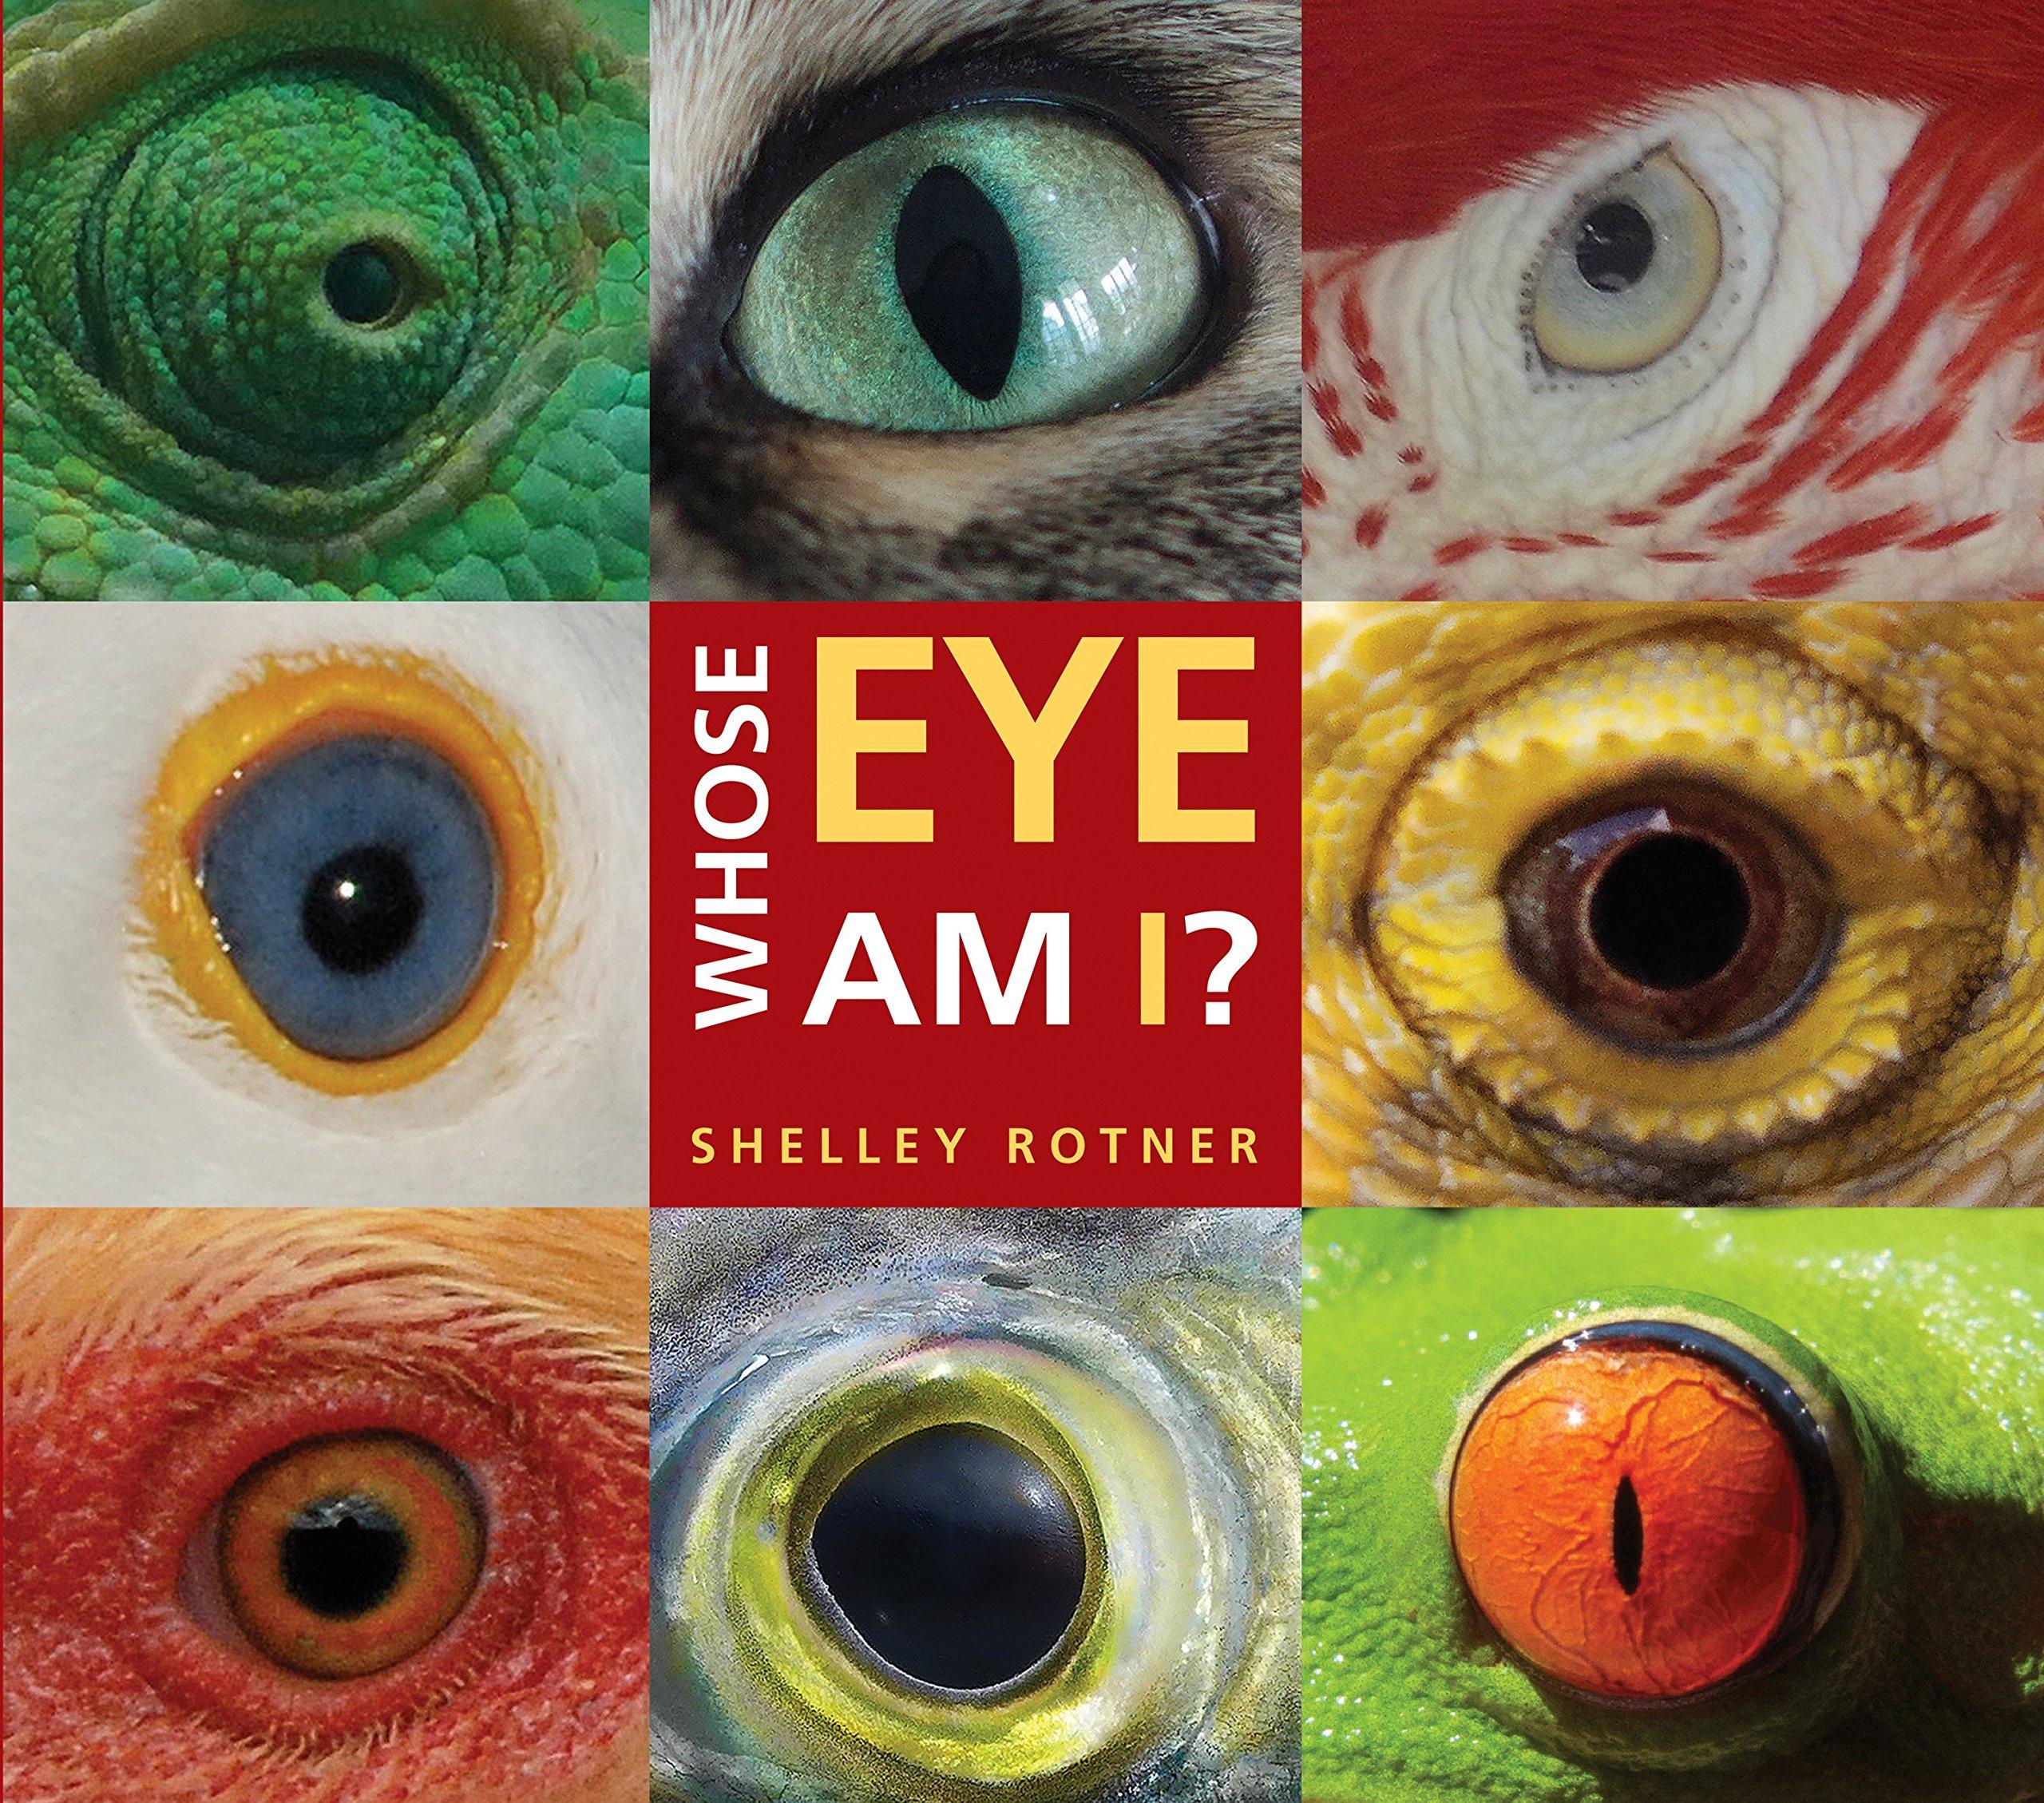 Whose Eye Am I?: Rotner, Shelley: 9780823435586: Amazon.com: Books